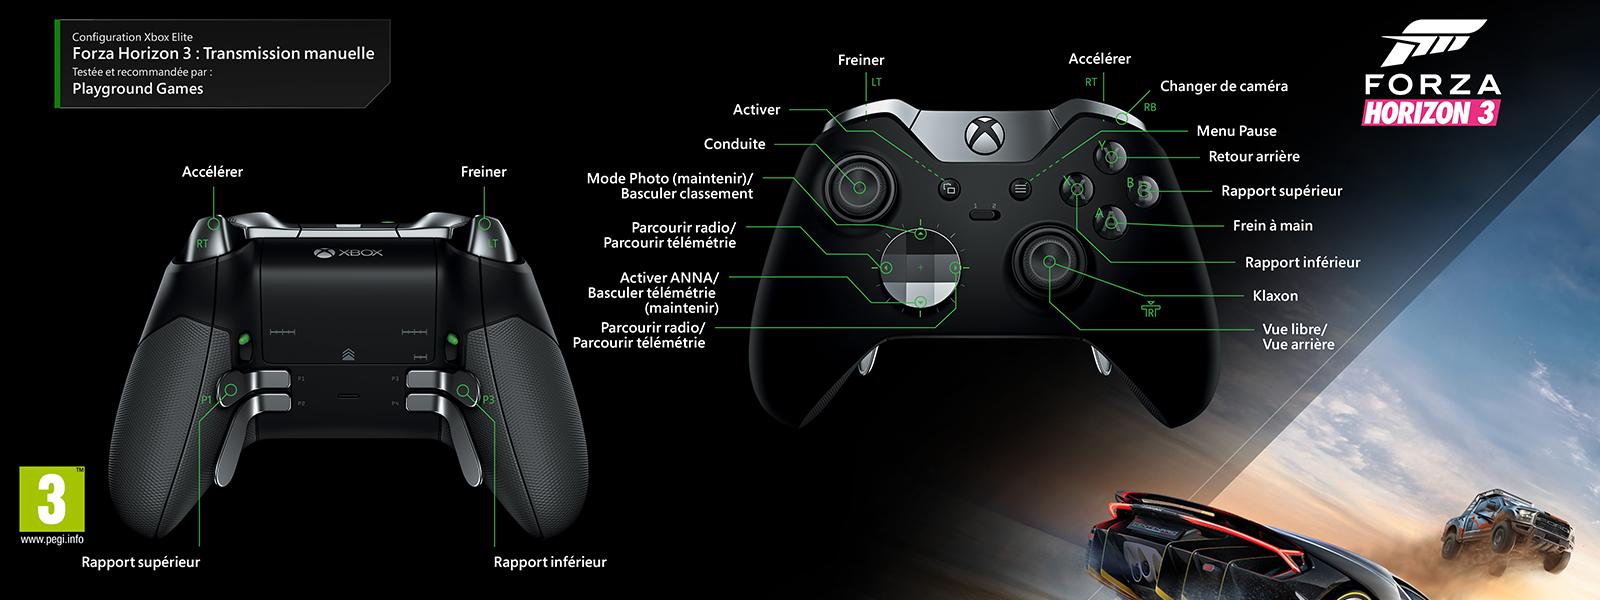 Forza Horizon3, configuration Elite Transmission manuelle